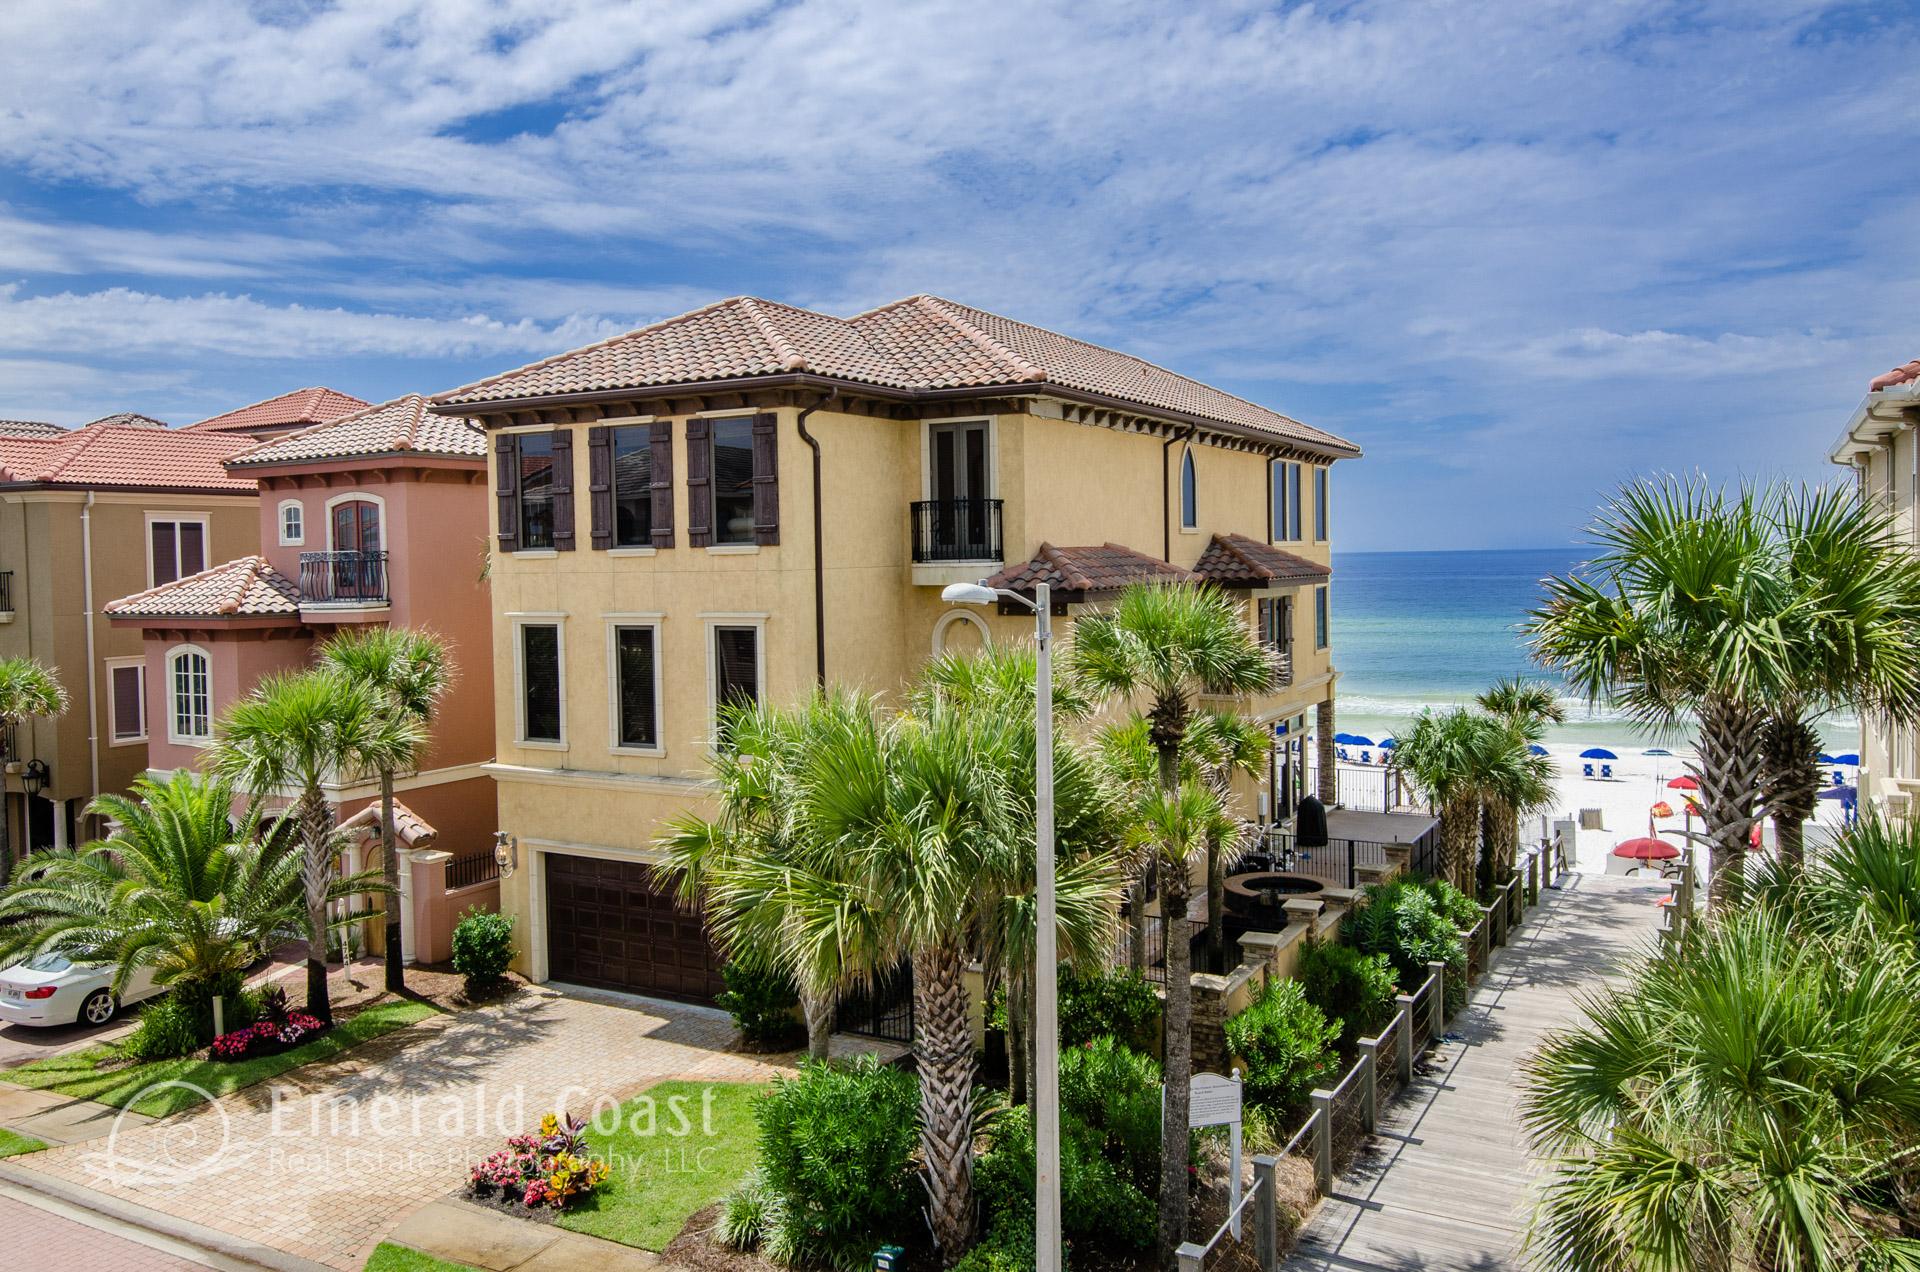 aerial photo of beach house in Destin, Florida